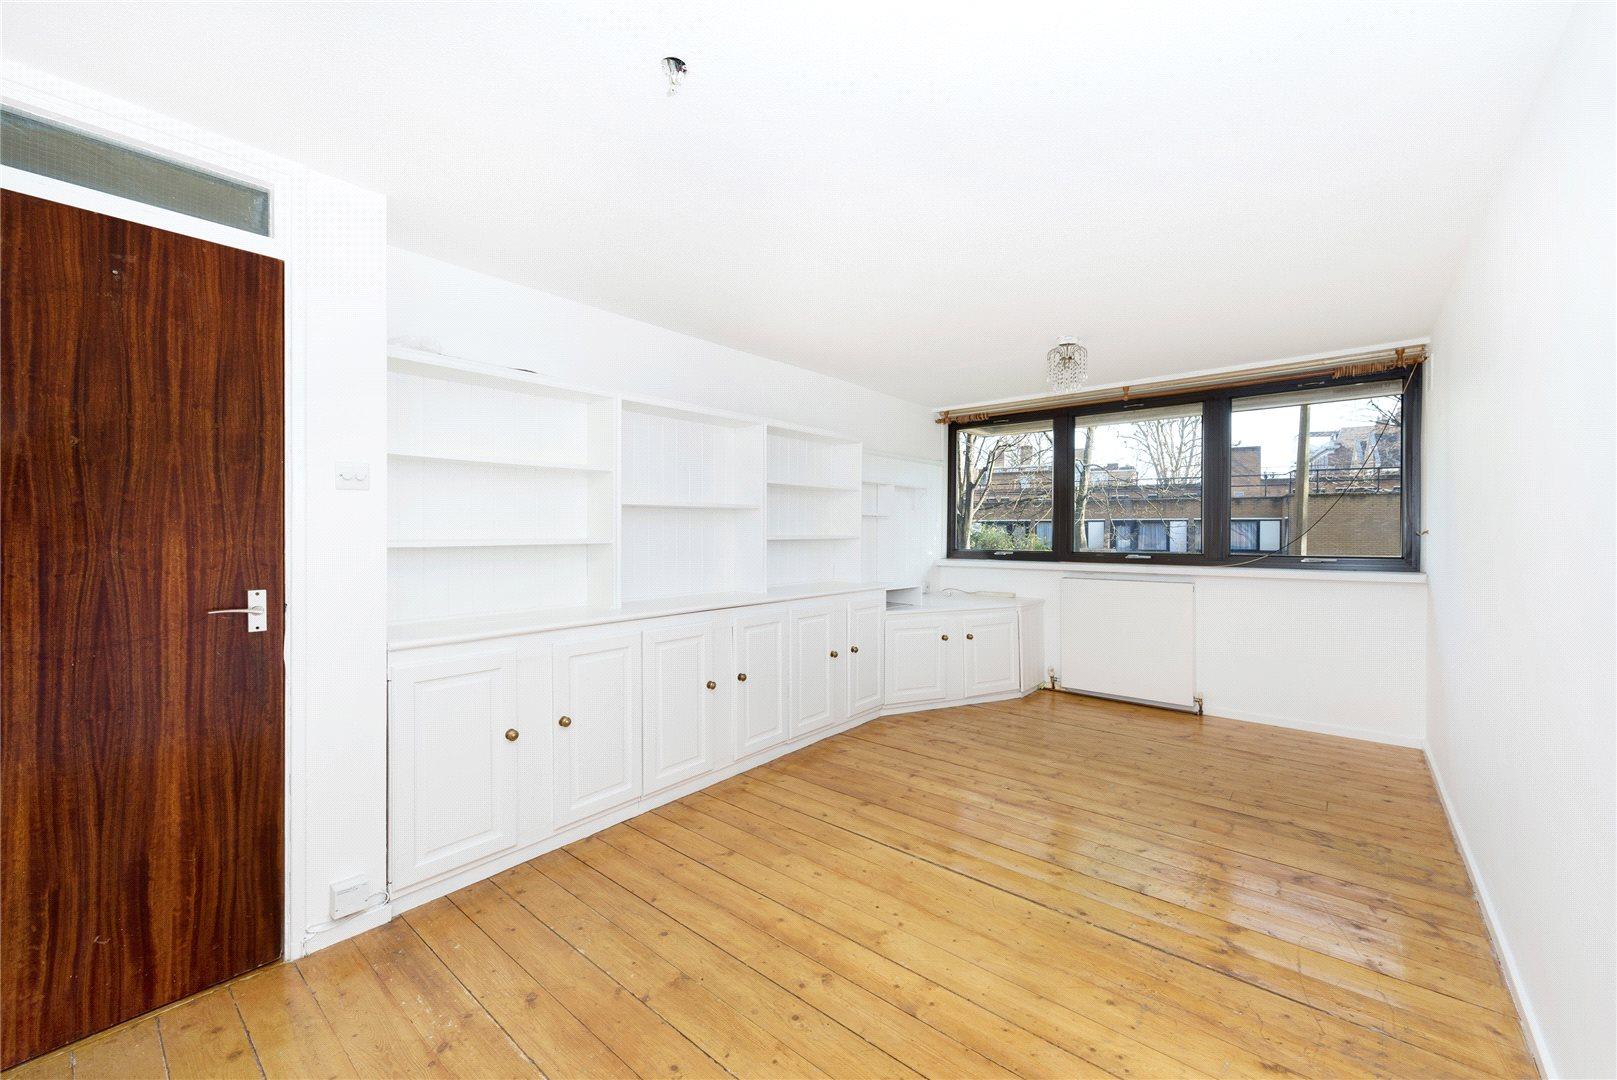 Tavistock Bedroom Furniture 2 Bedroom Property To Let In Harford House 35 Tavistock Crescent